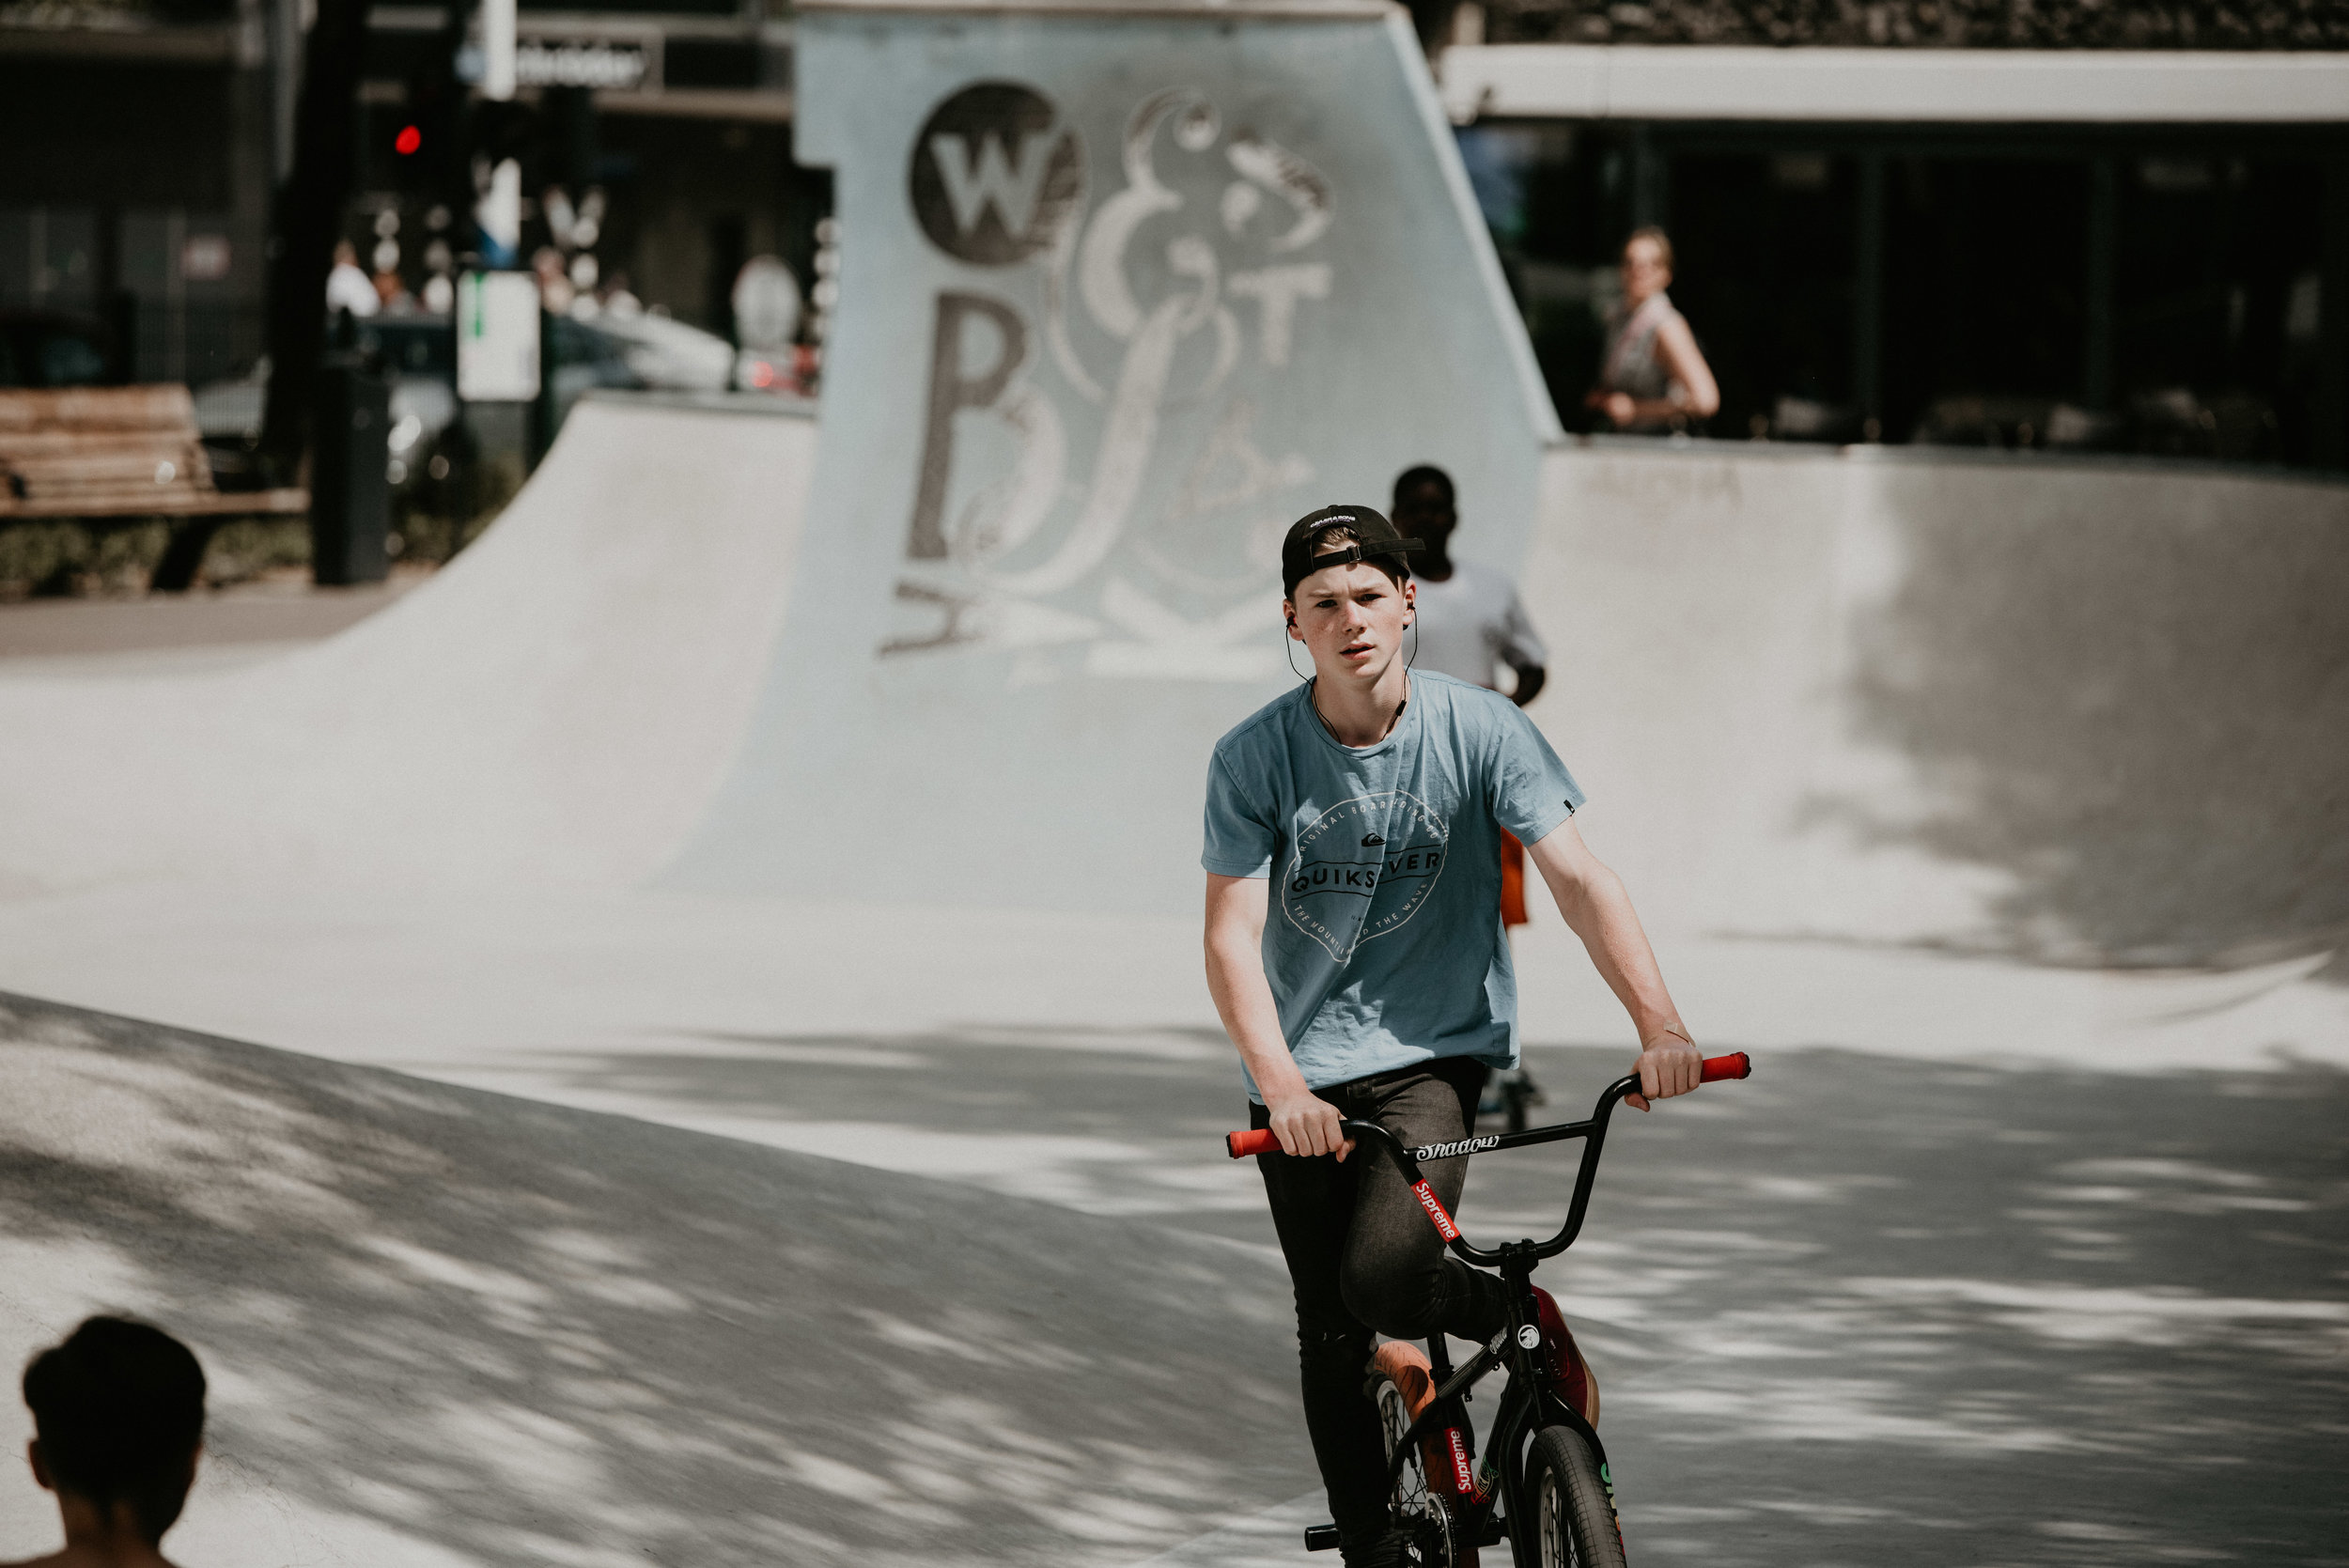 Teenage boy at the rotterdam skatepark on westblaak. He is riding a bmx bike